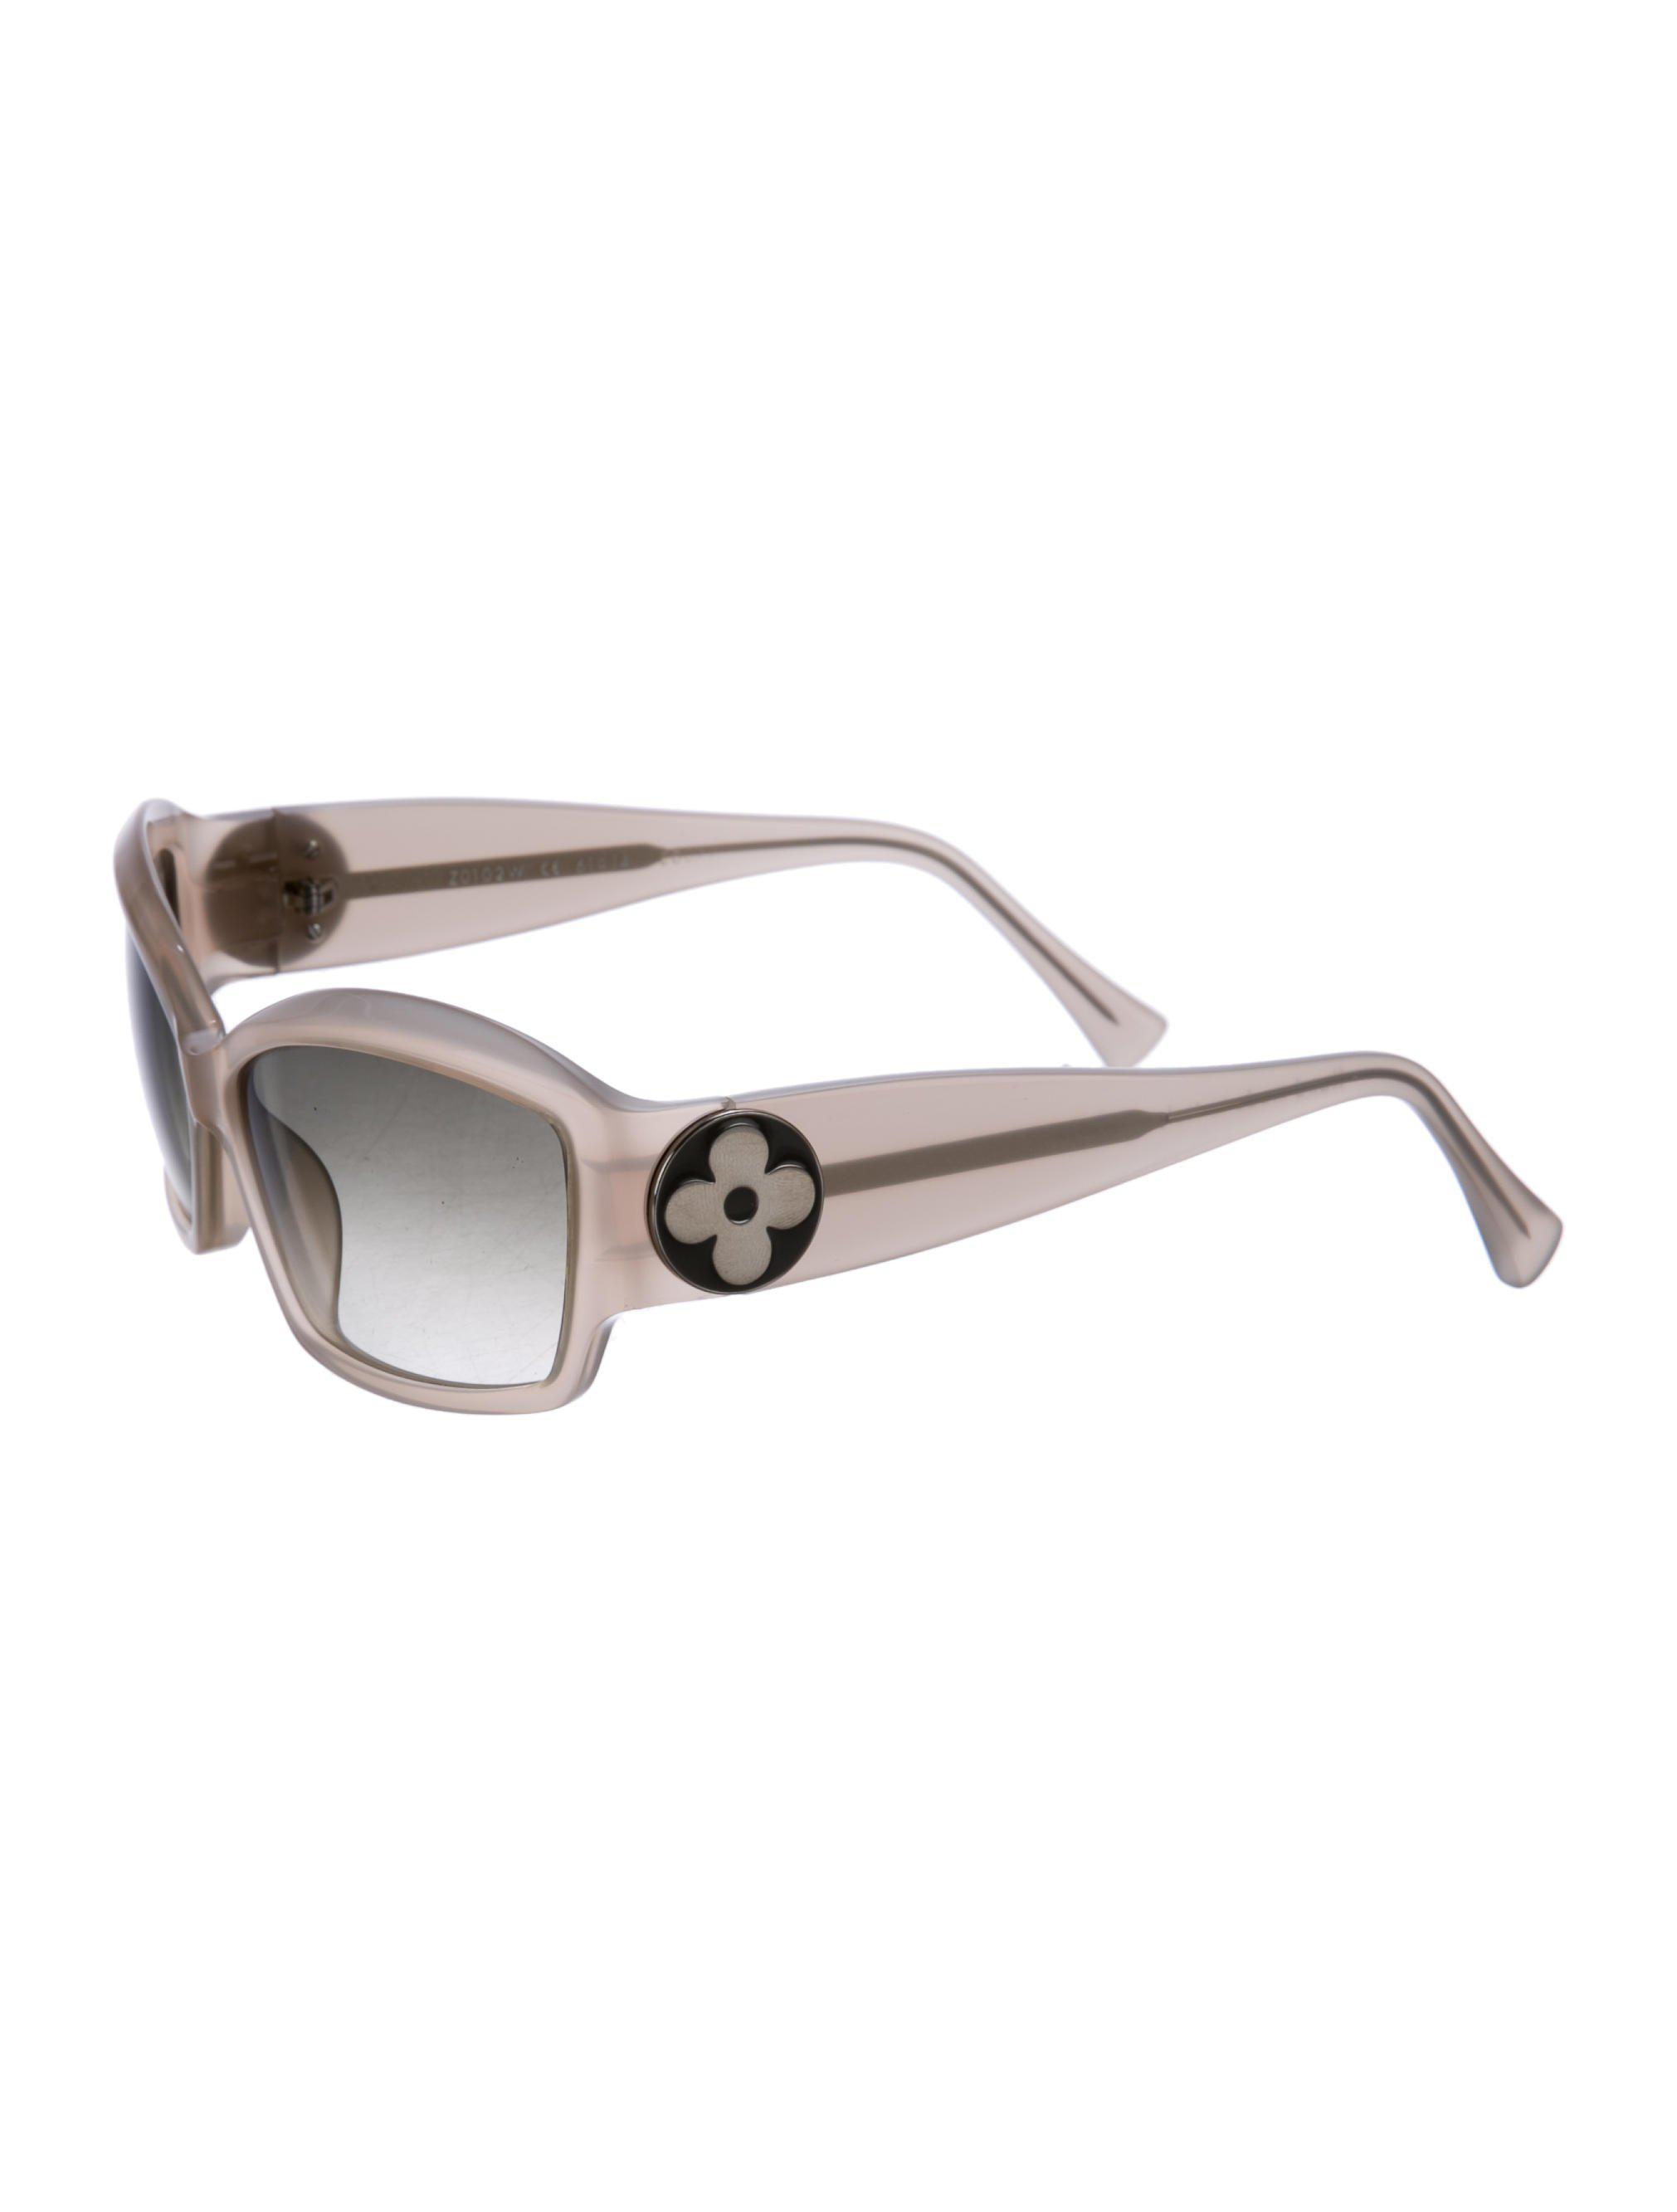 f377a5a77d11 Lyst - Louis Vuitton Ursula Gradient Sunglasses Neutrals in Natural